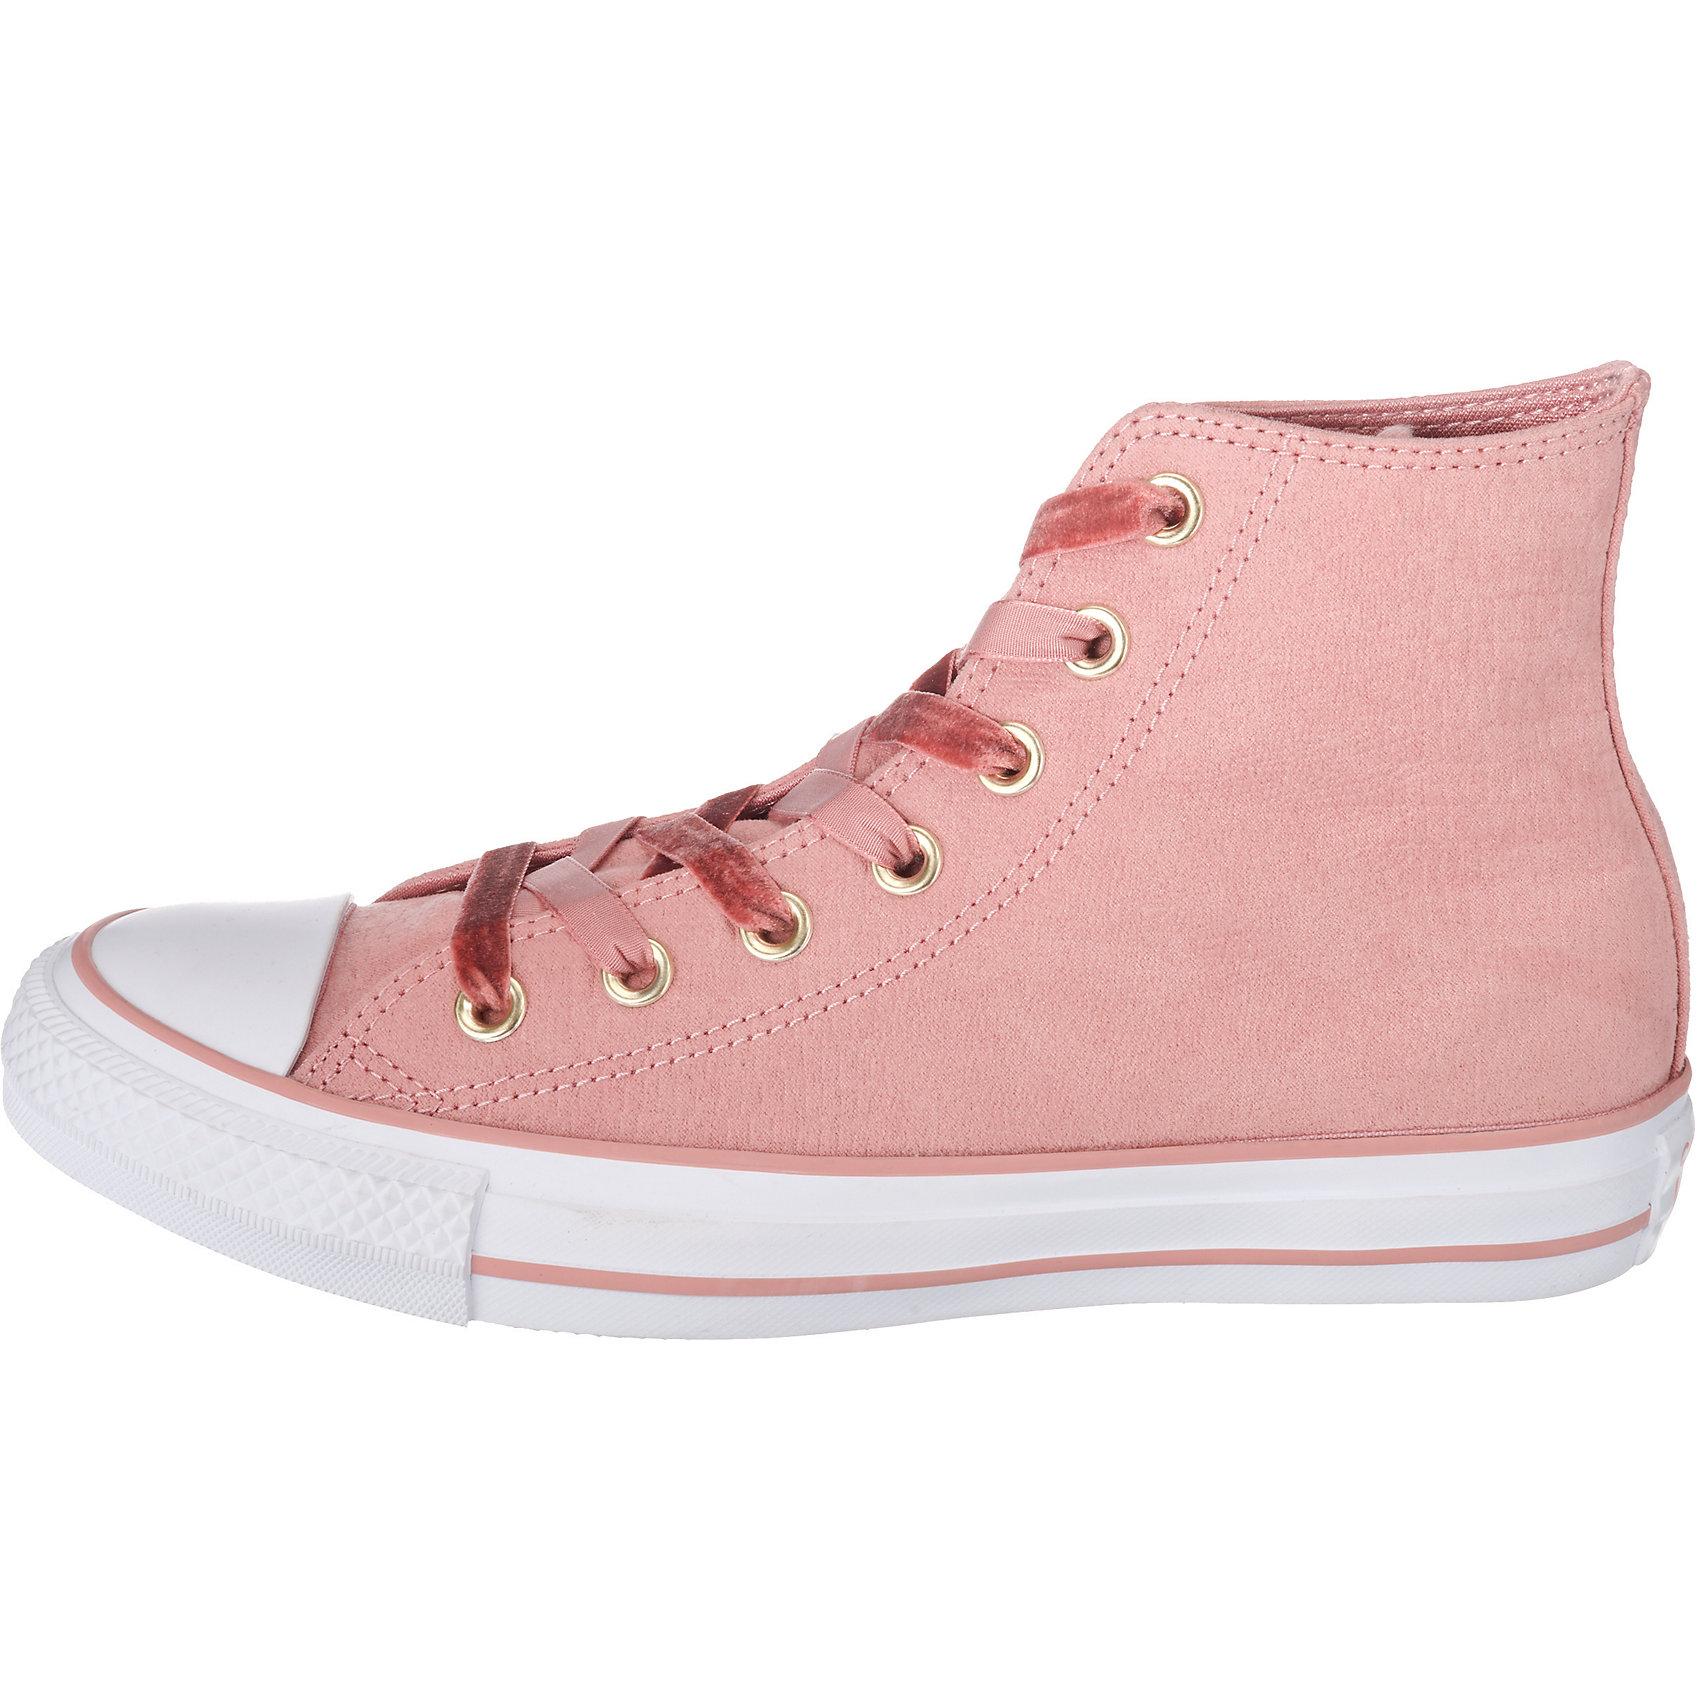 5c67405f8f ... NEW Nike Air Max 90 Ultra 2.0 Flyknit Shoes 875943 875943 875943 200  Medium Olive Size ...